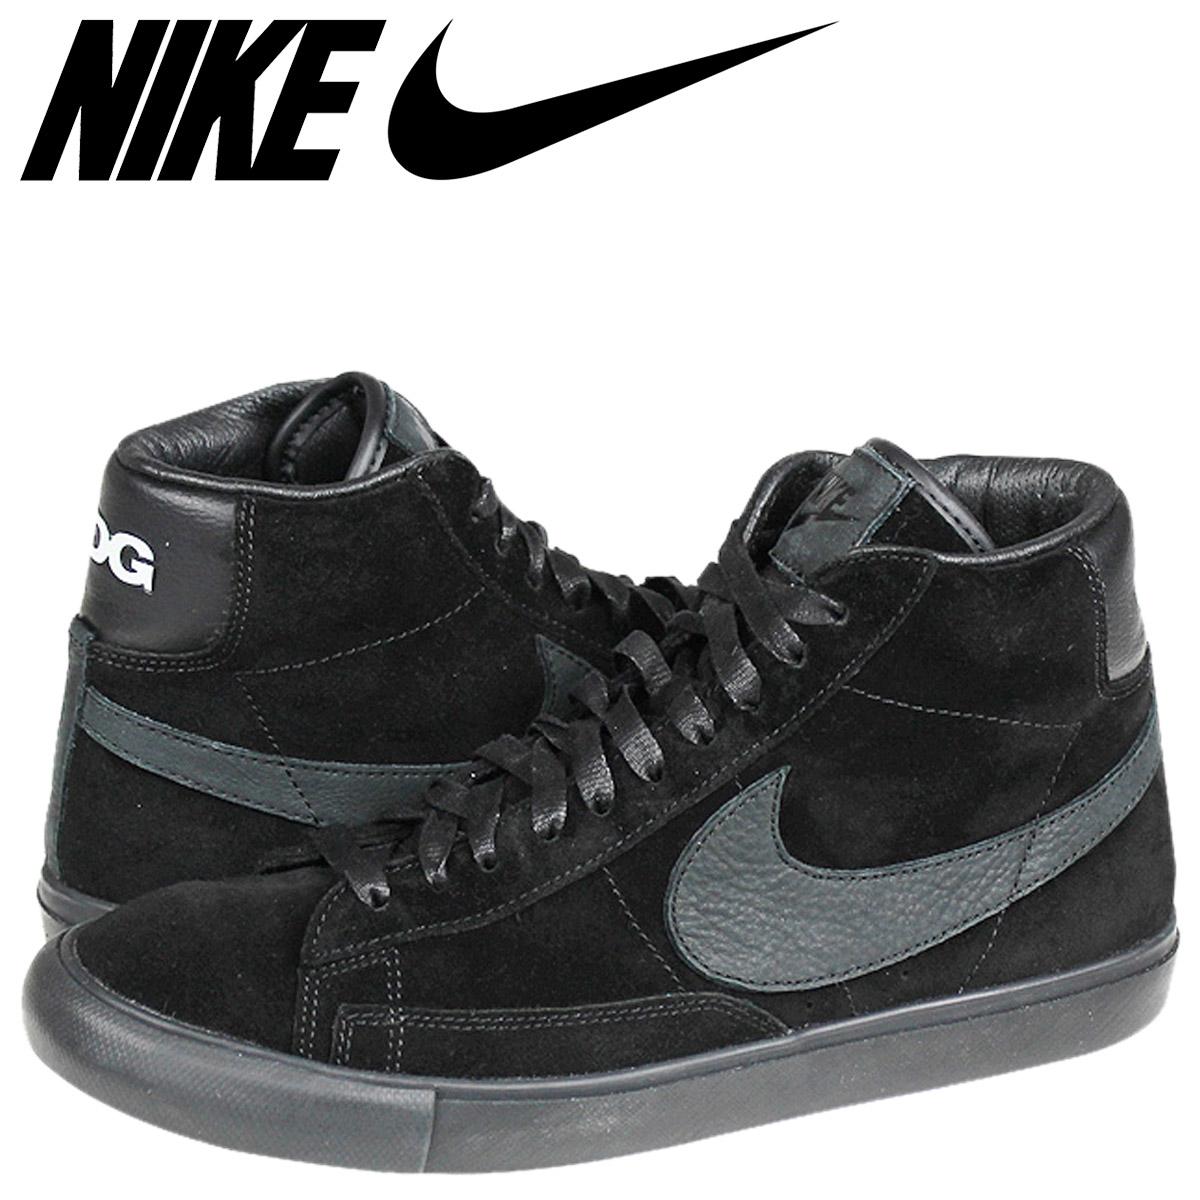 buy popular aa3e1 08944 NIKE Nike blazer sneakers BLAZER HI SP BLACK COMME des GARCONS blazer high  black black コムデギャルソンブラザーコラボ CDG 704,571-001 black black men